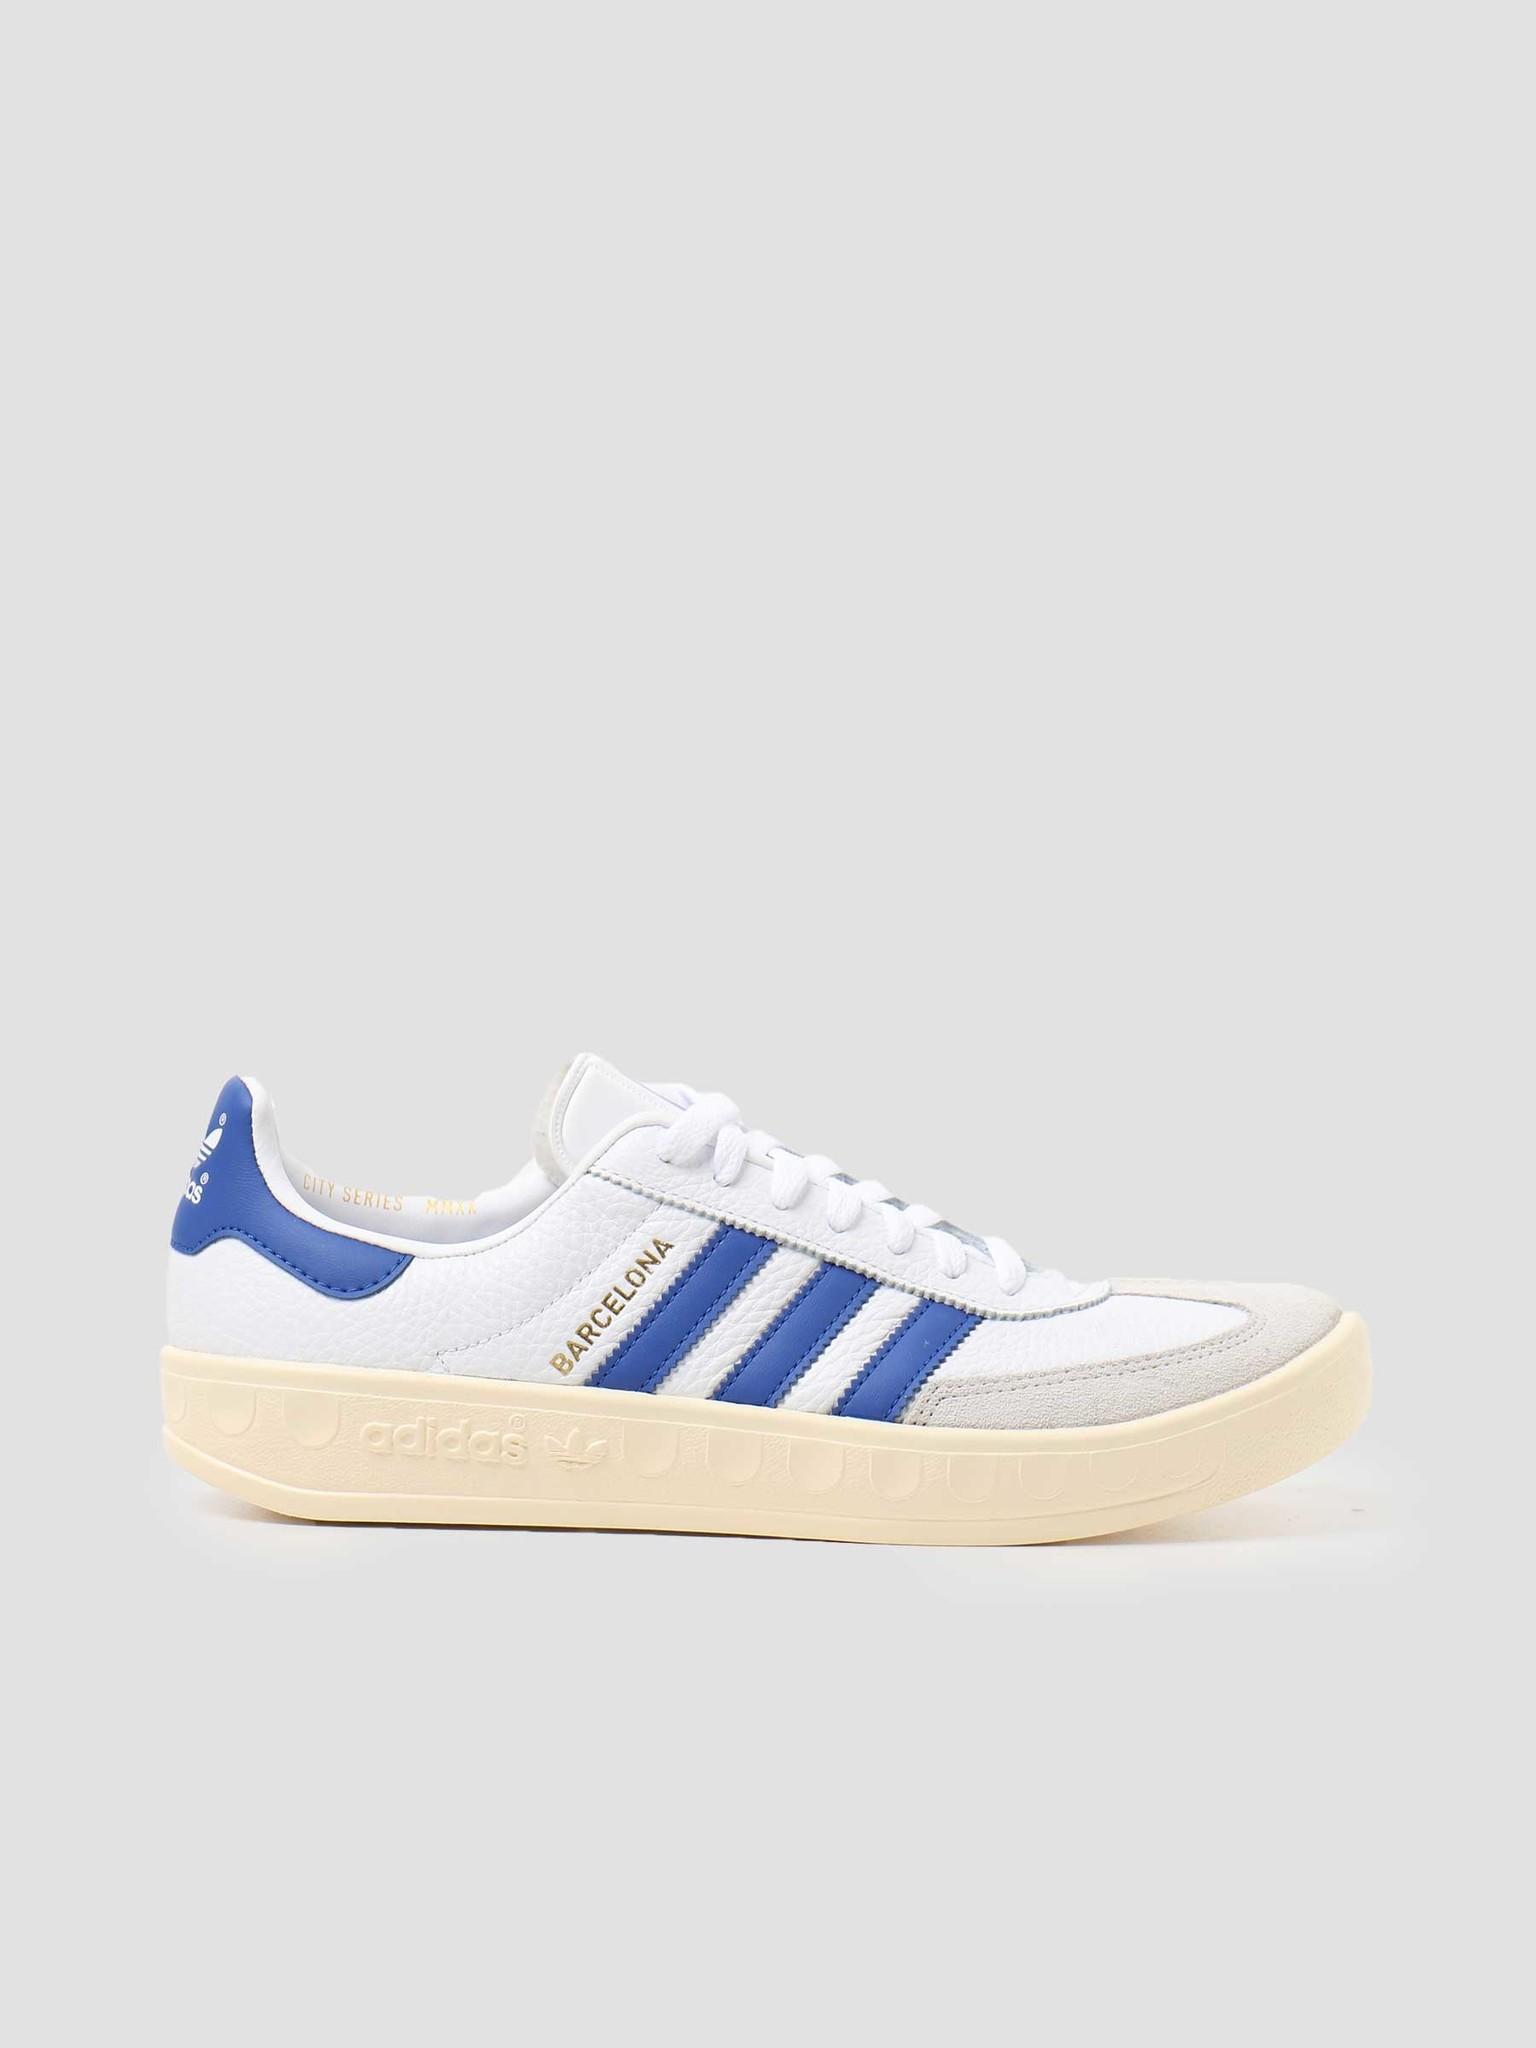 adidas adidas City Series Barcelona Cloud White Blue Cream White